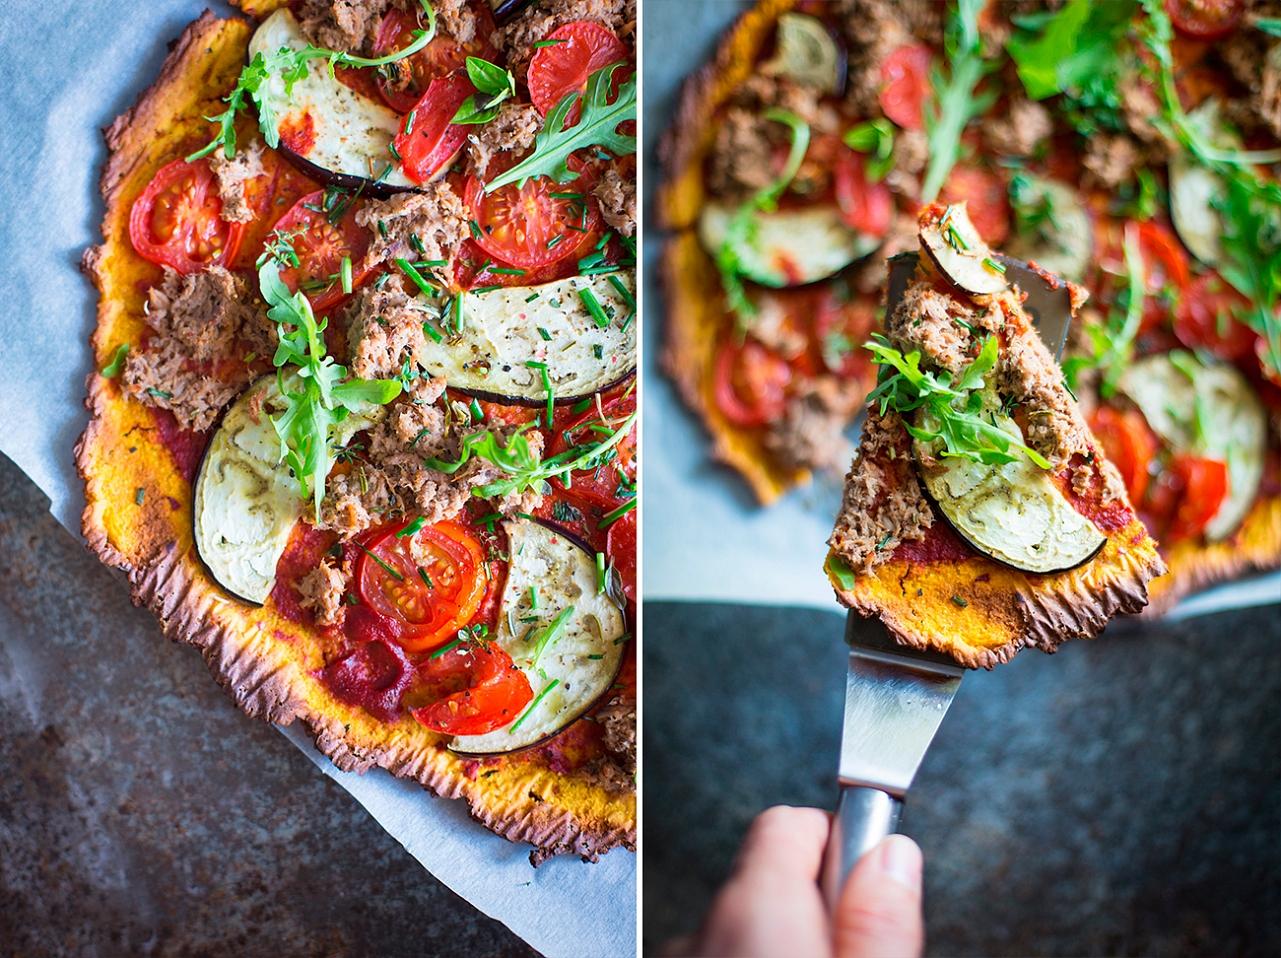 Batátová pizza - tuňák, lilek